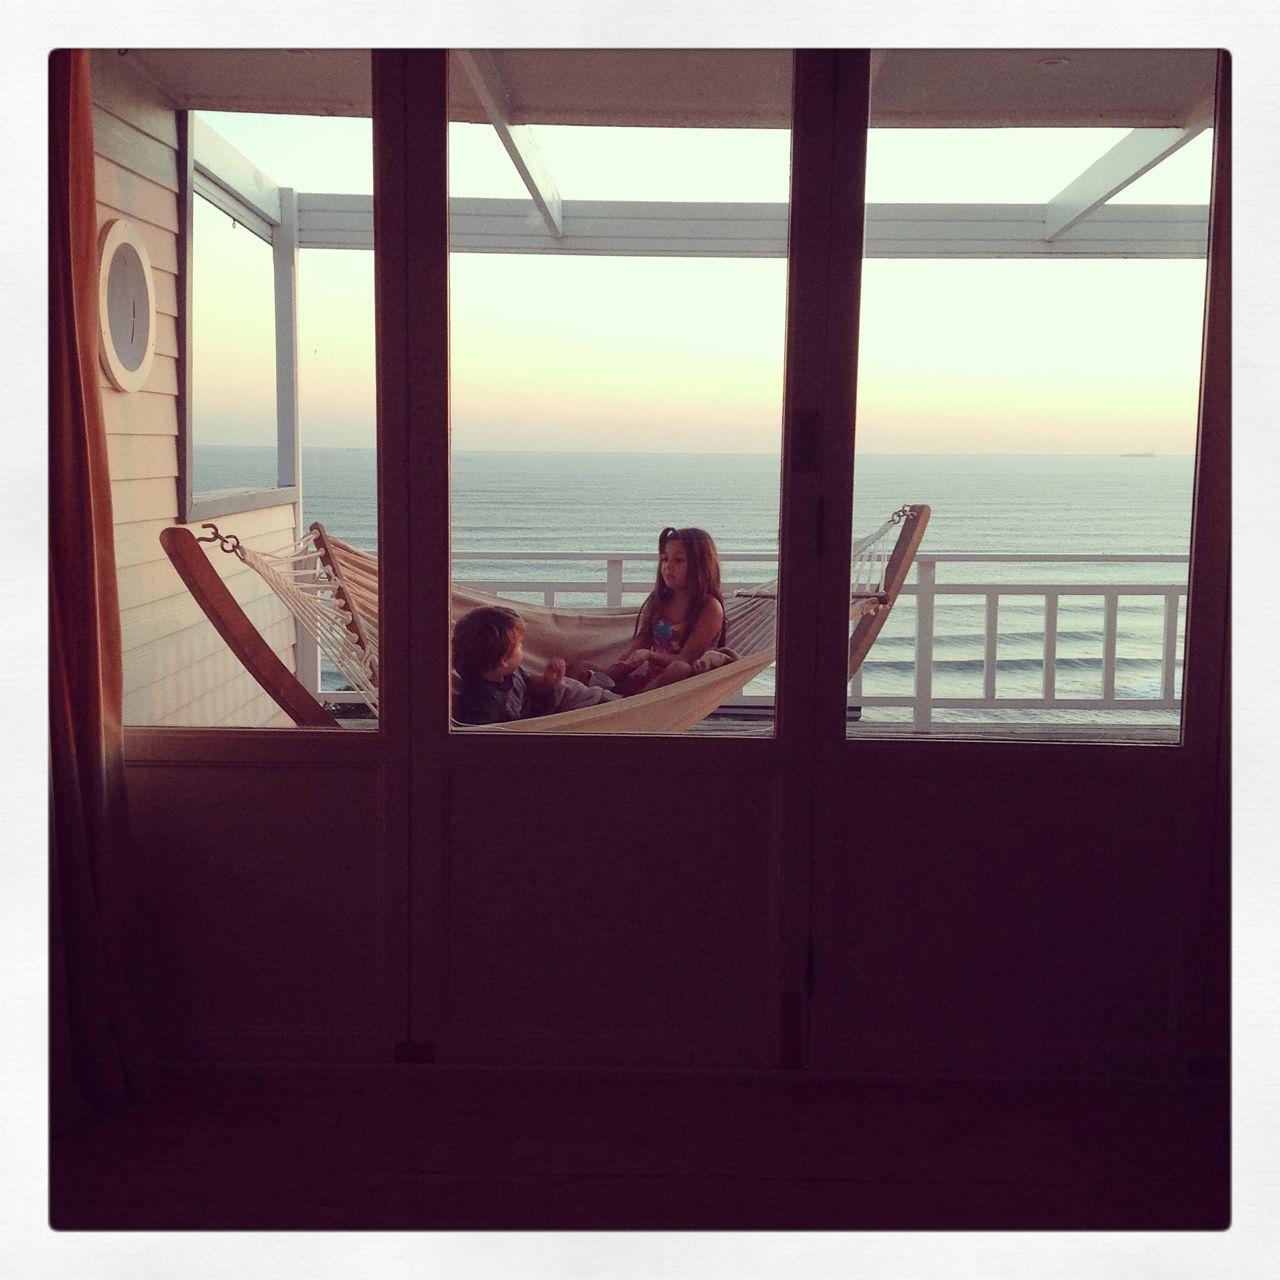 """The Blue"" at Misty Cliffs - where we spent 3 wonderful months..."